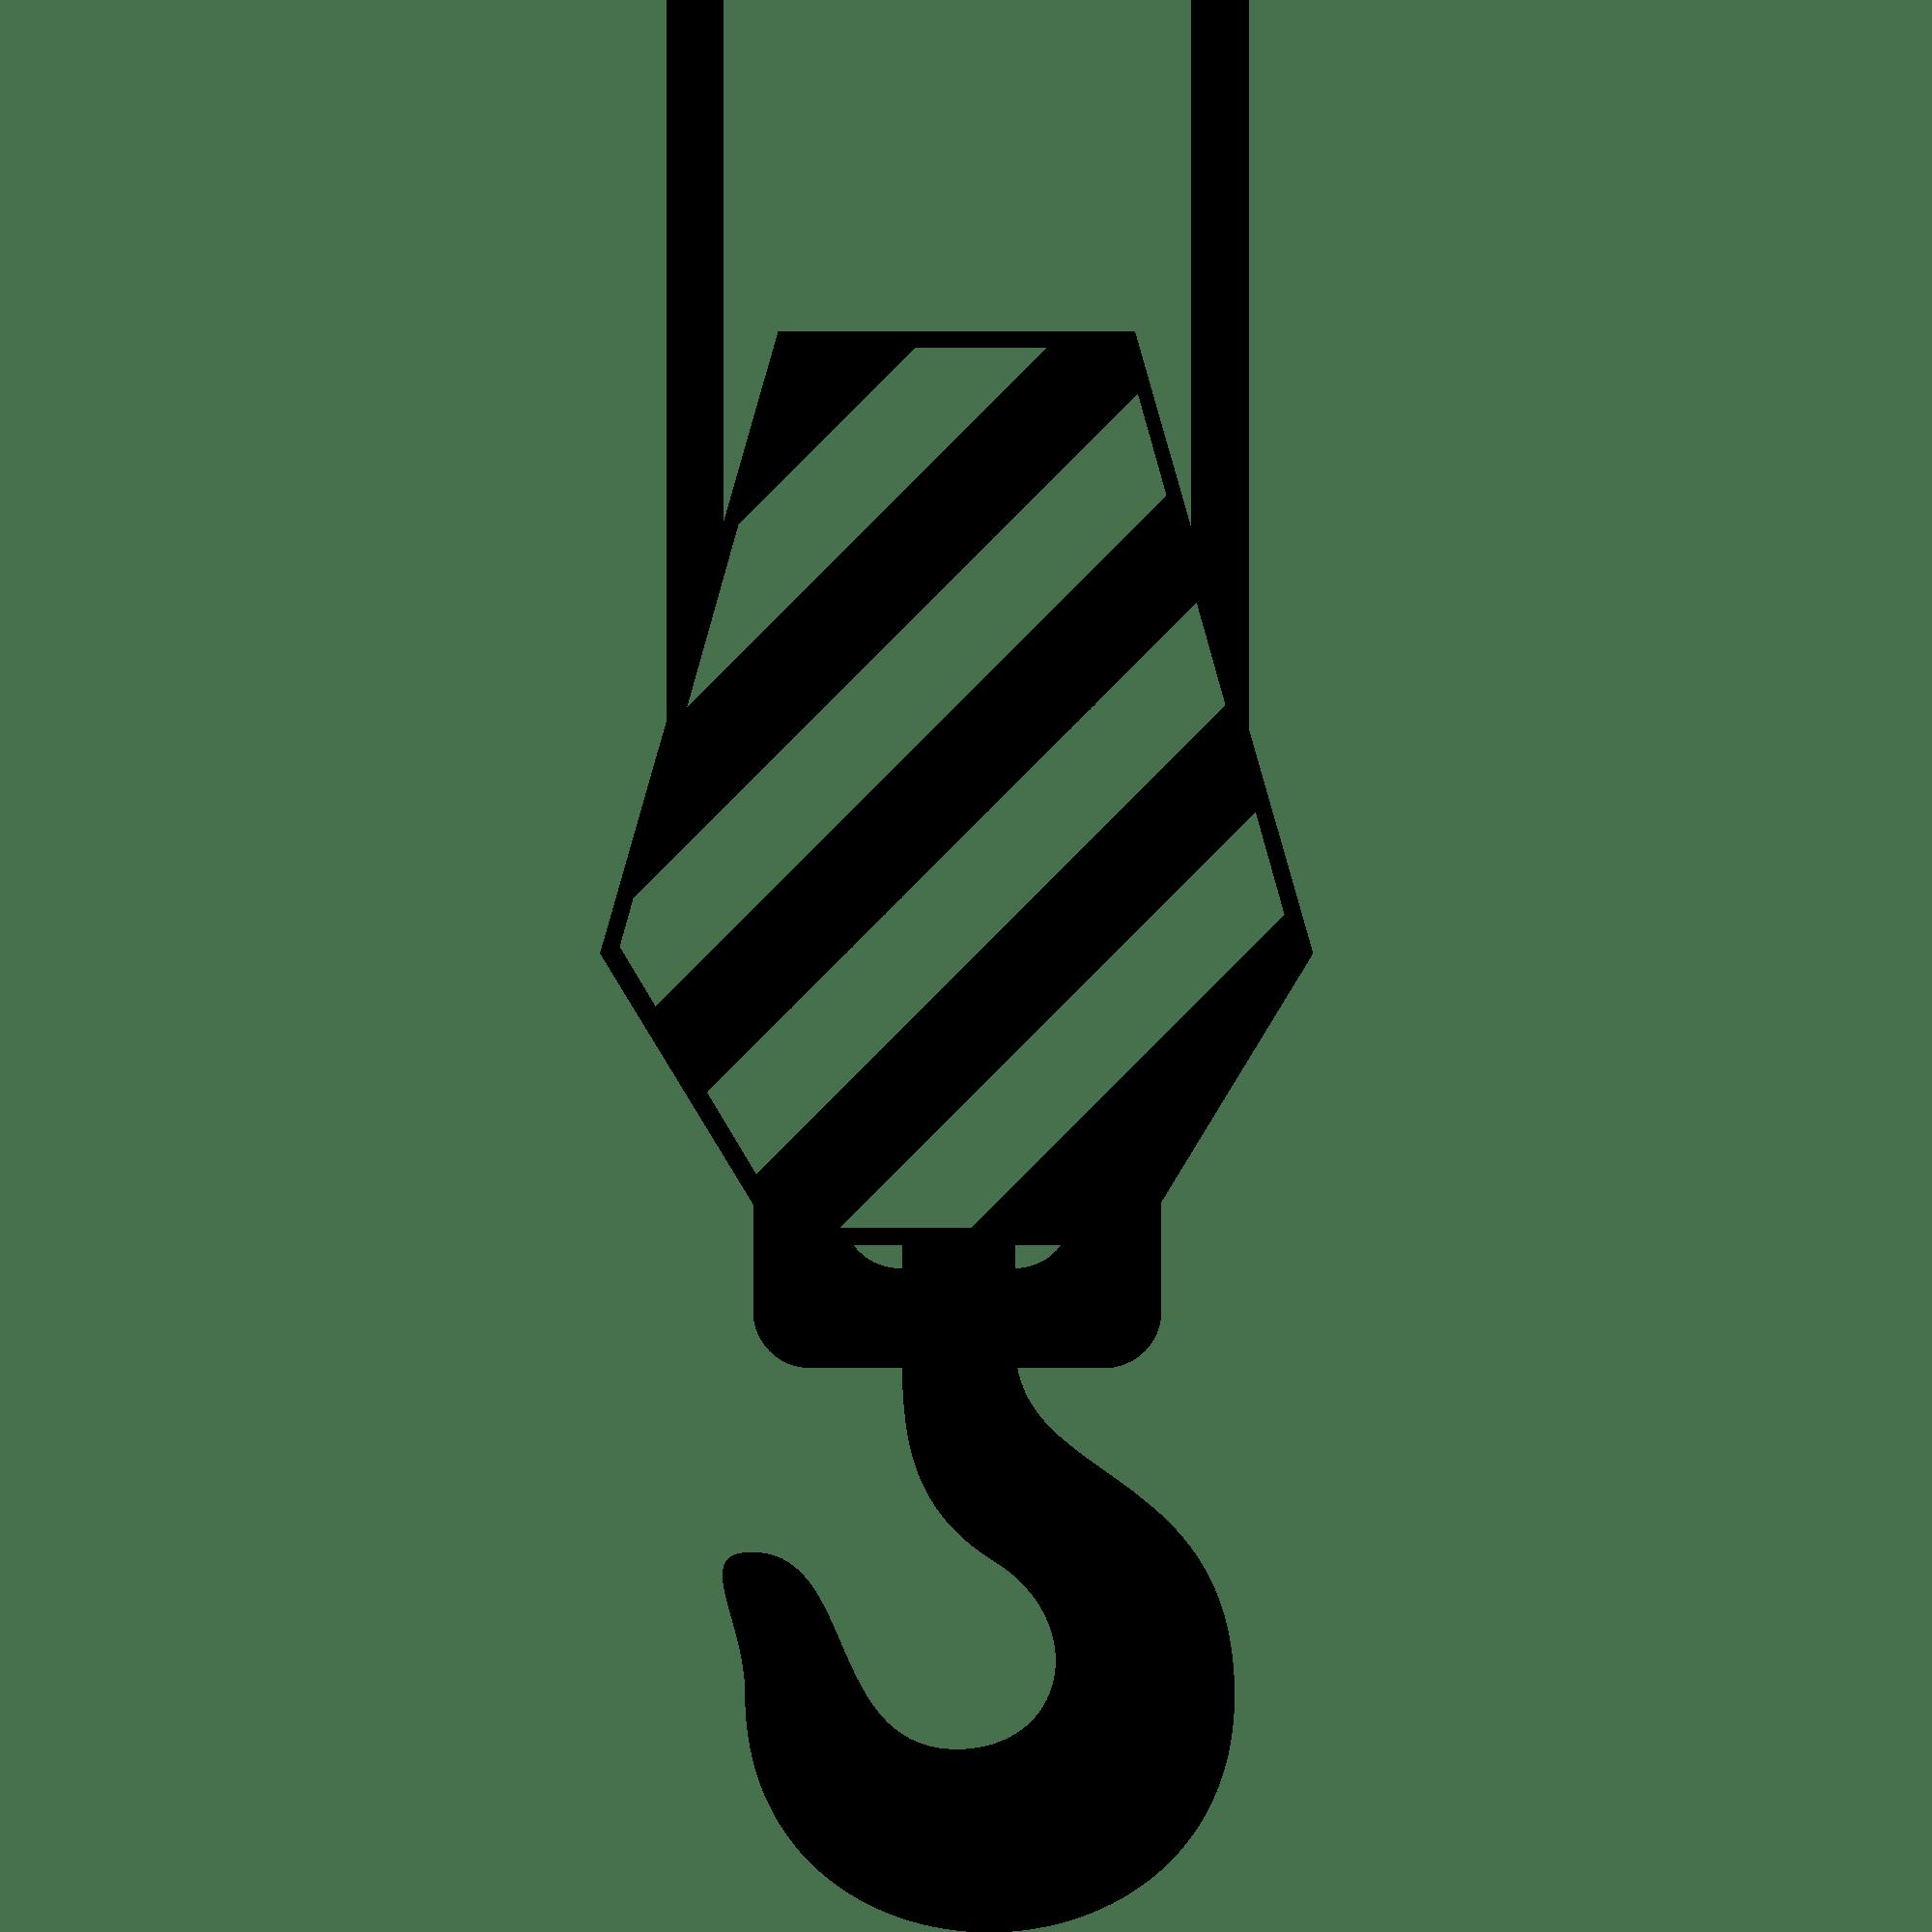 Hook transparent png stickpng. Crane clipart constuction